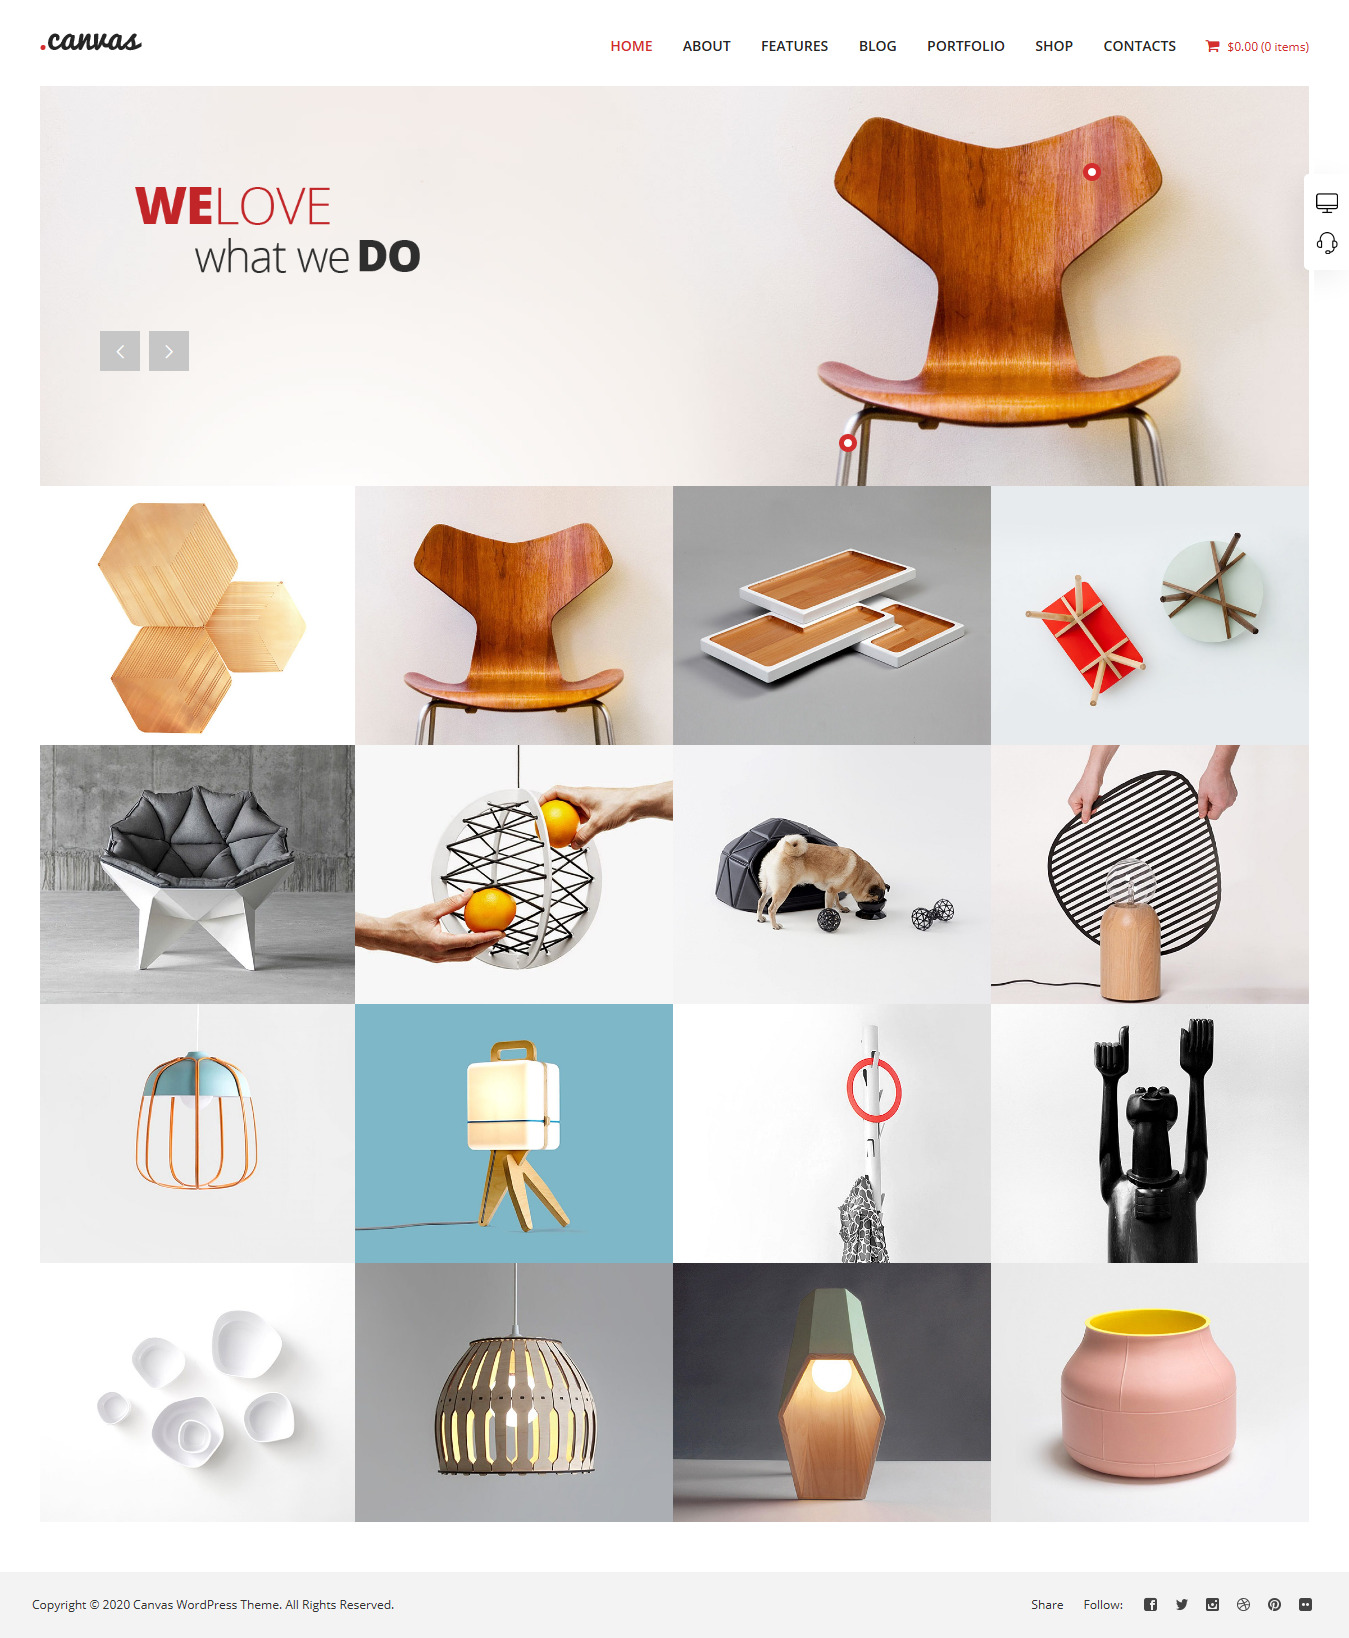 canvas best premium interior design wordpress theme 1 - 10+ Best Premium Interior Design WordPress Themes